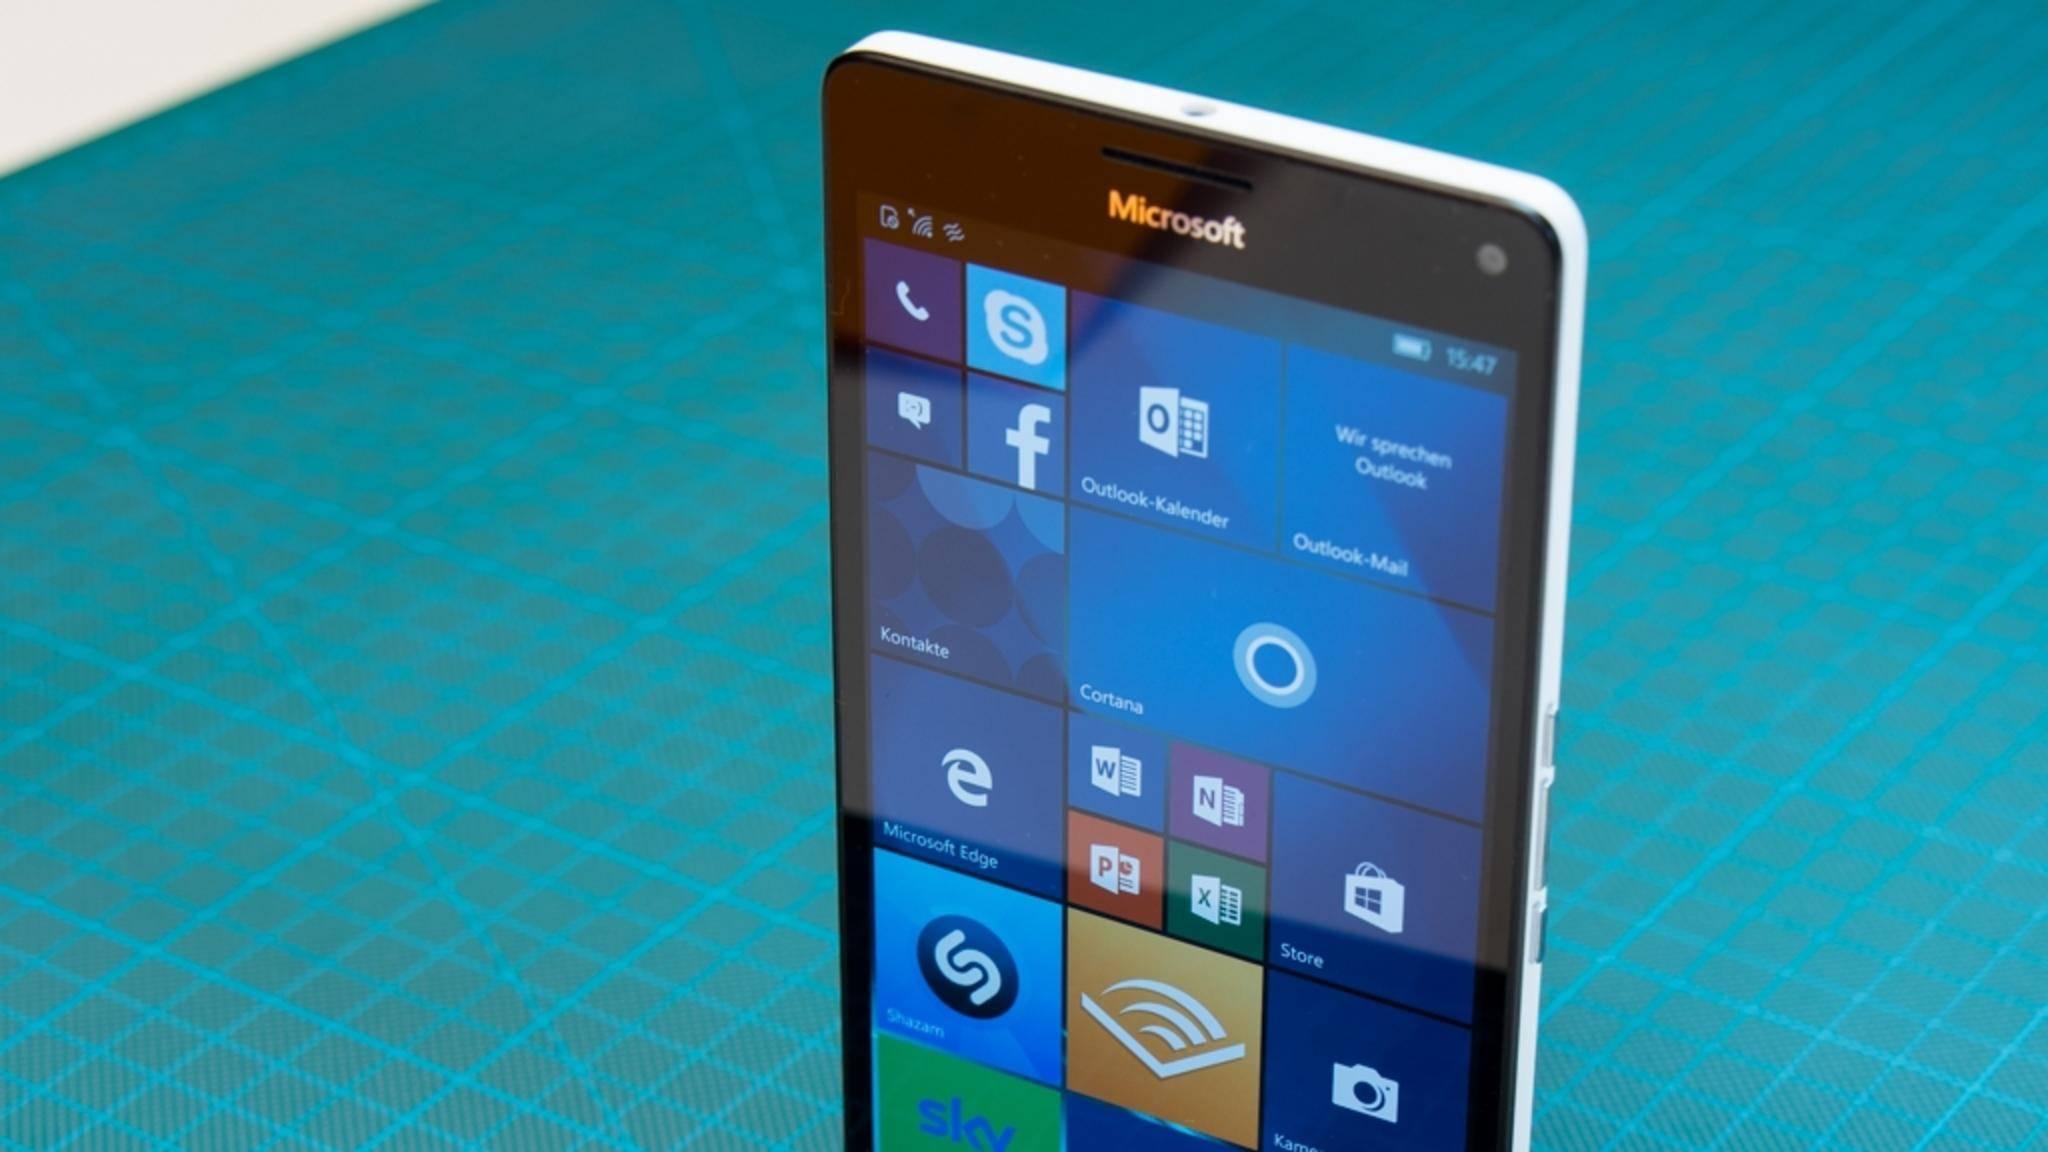 Lumia-Smartphones bekommen endlich das Creators Update.